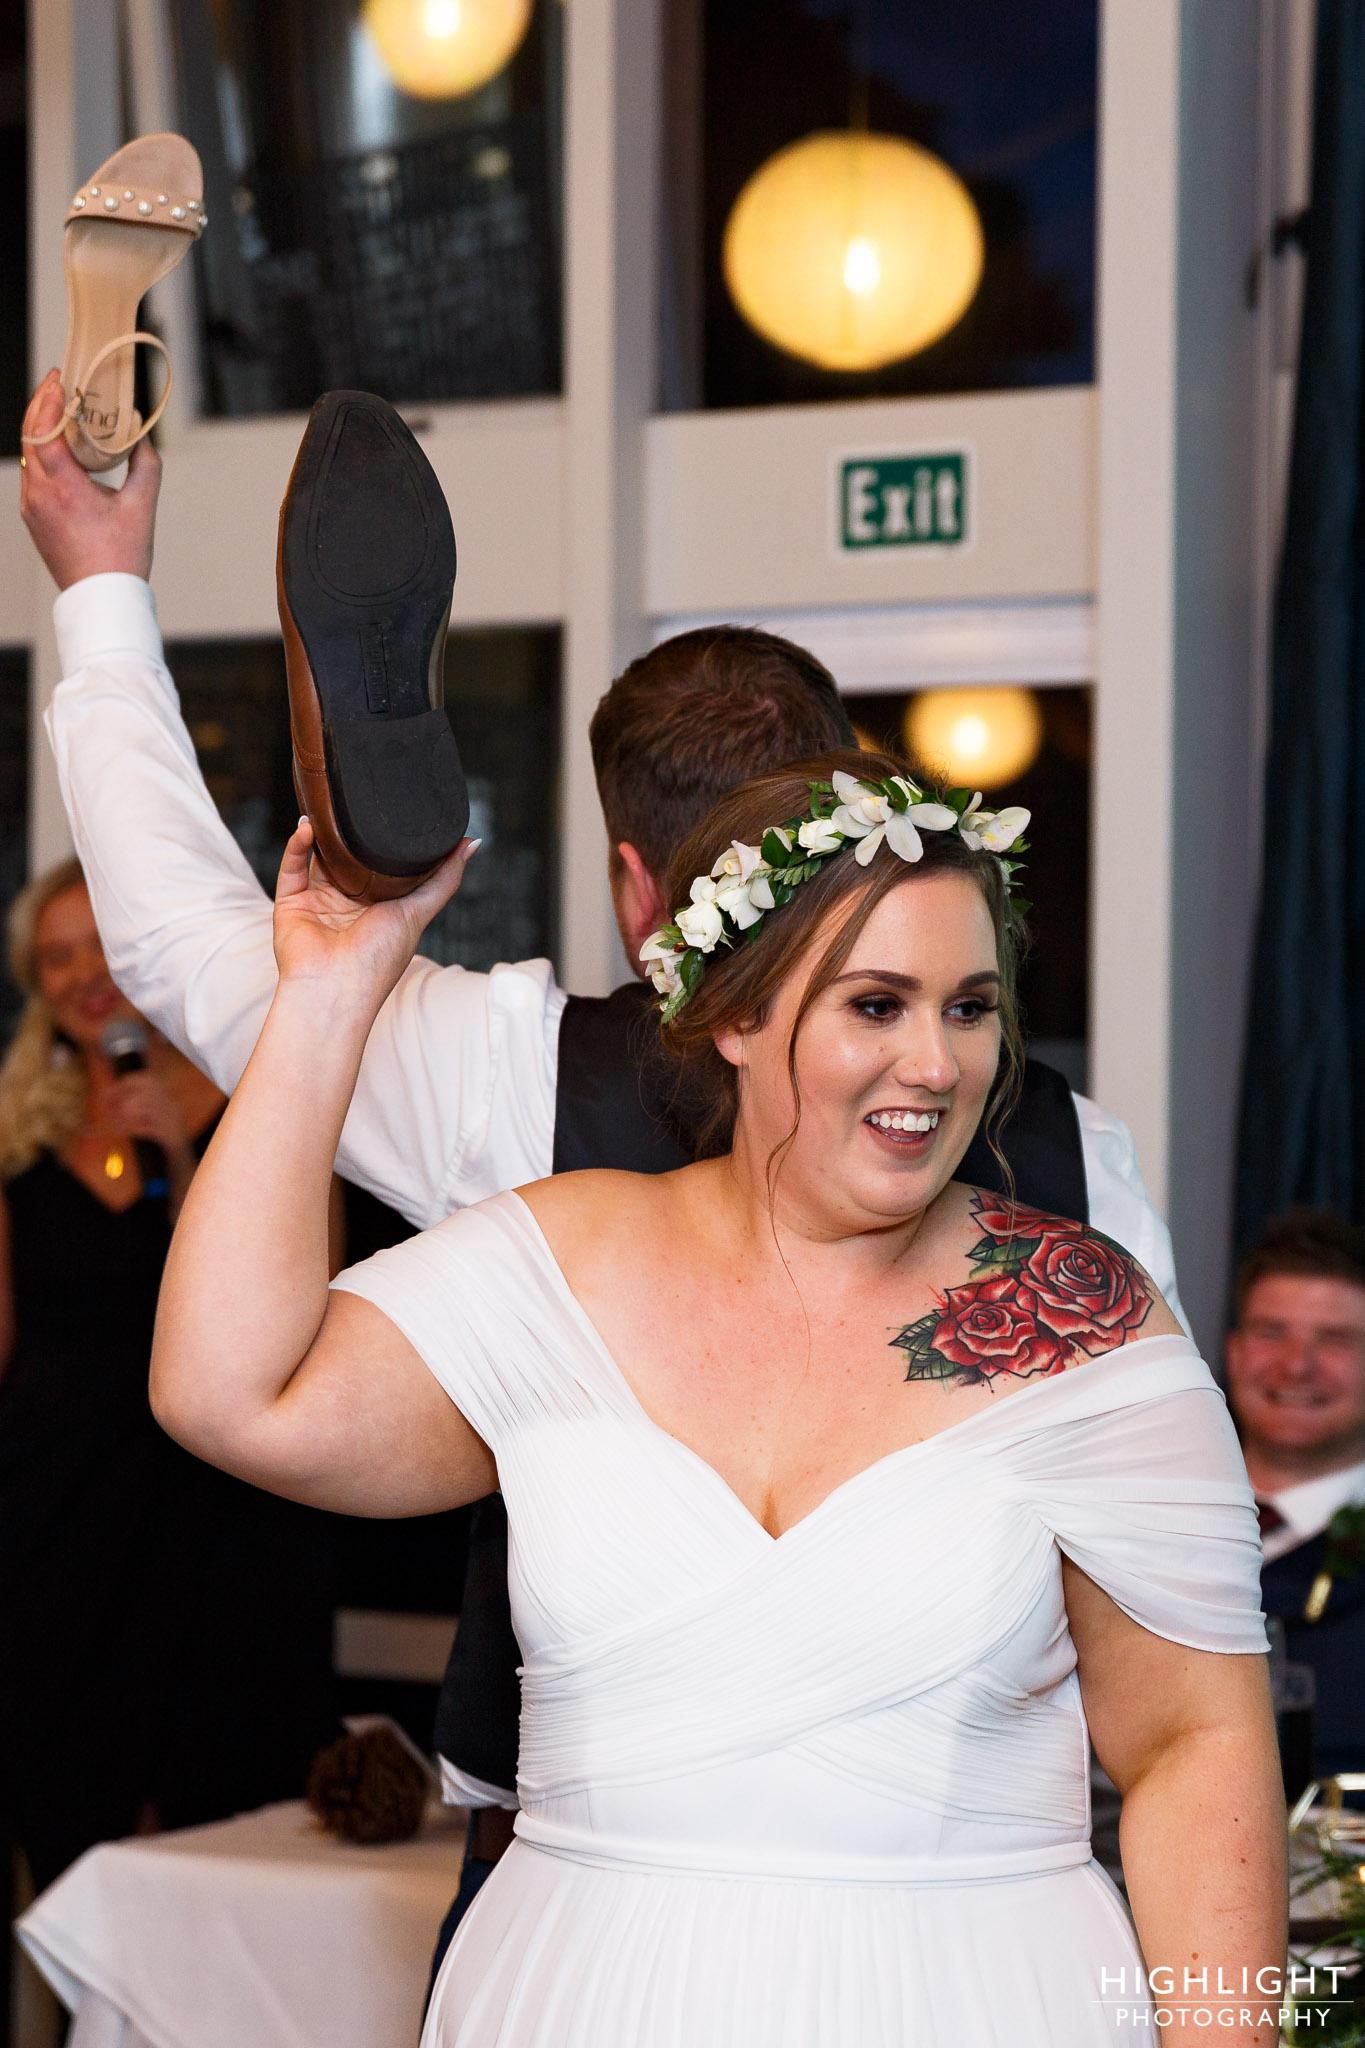 Highlight-wedding-photography-new-zealand-palmerston-north-115.jpg